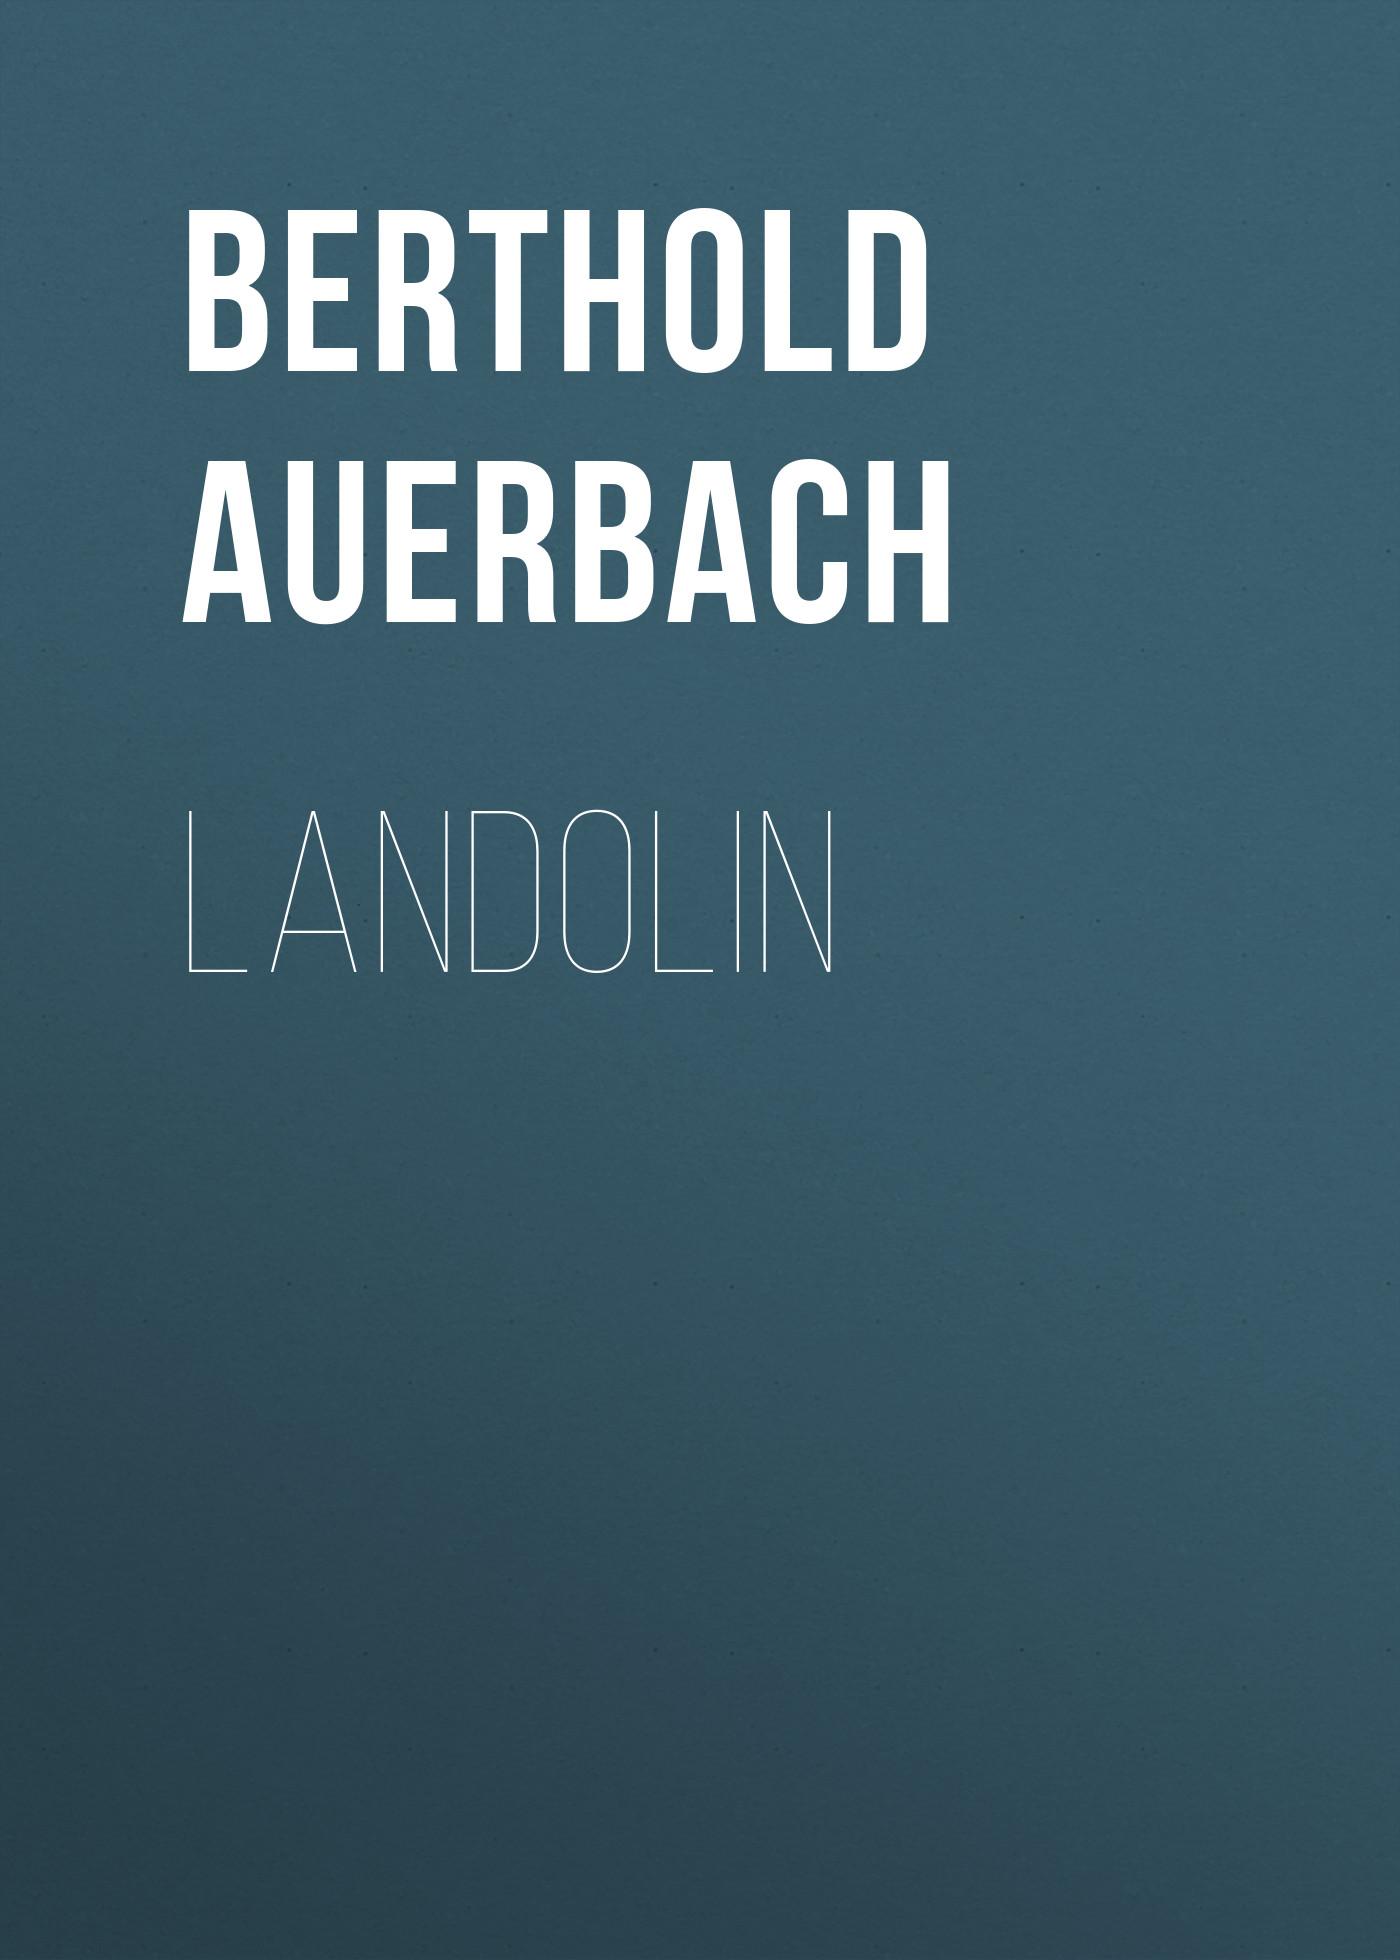 Auerbach Berthold Landolin auerbach berthold landolin